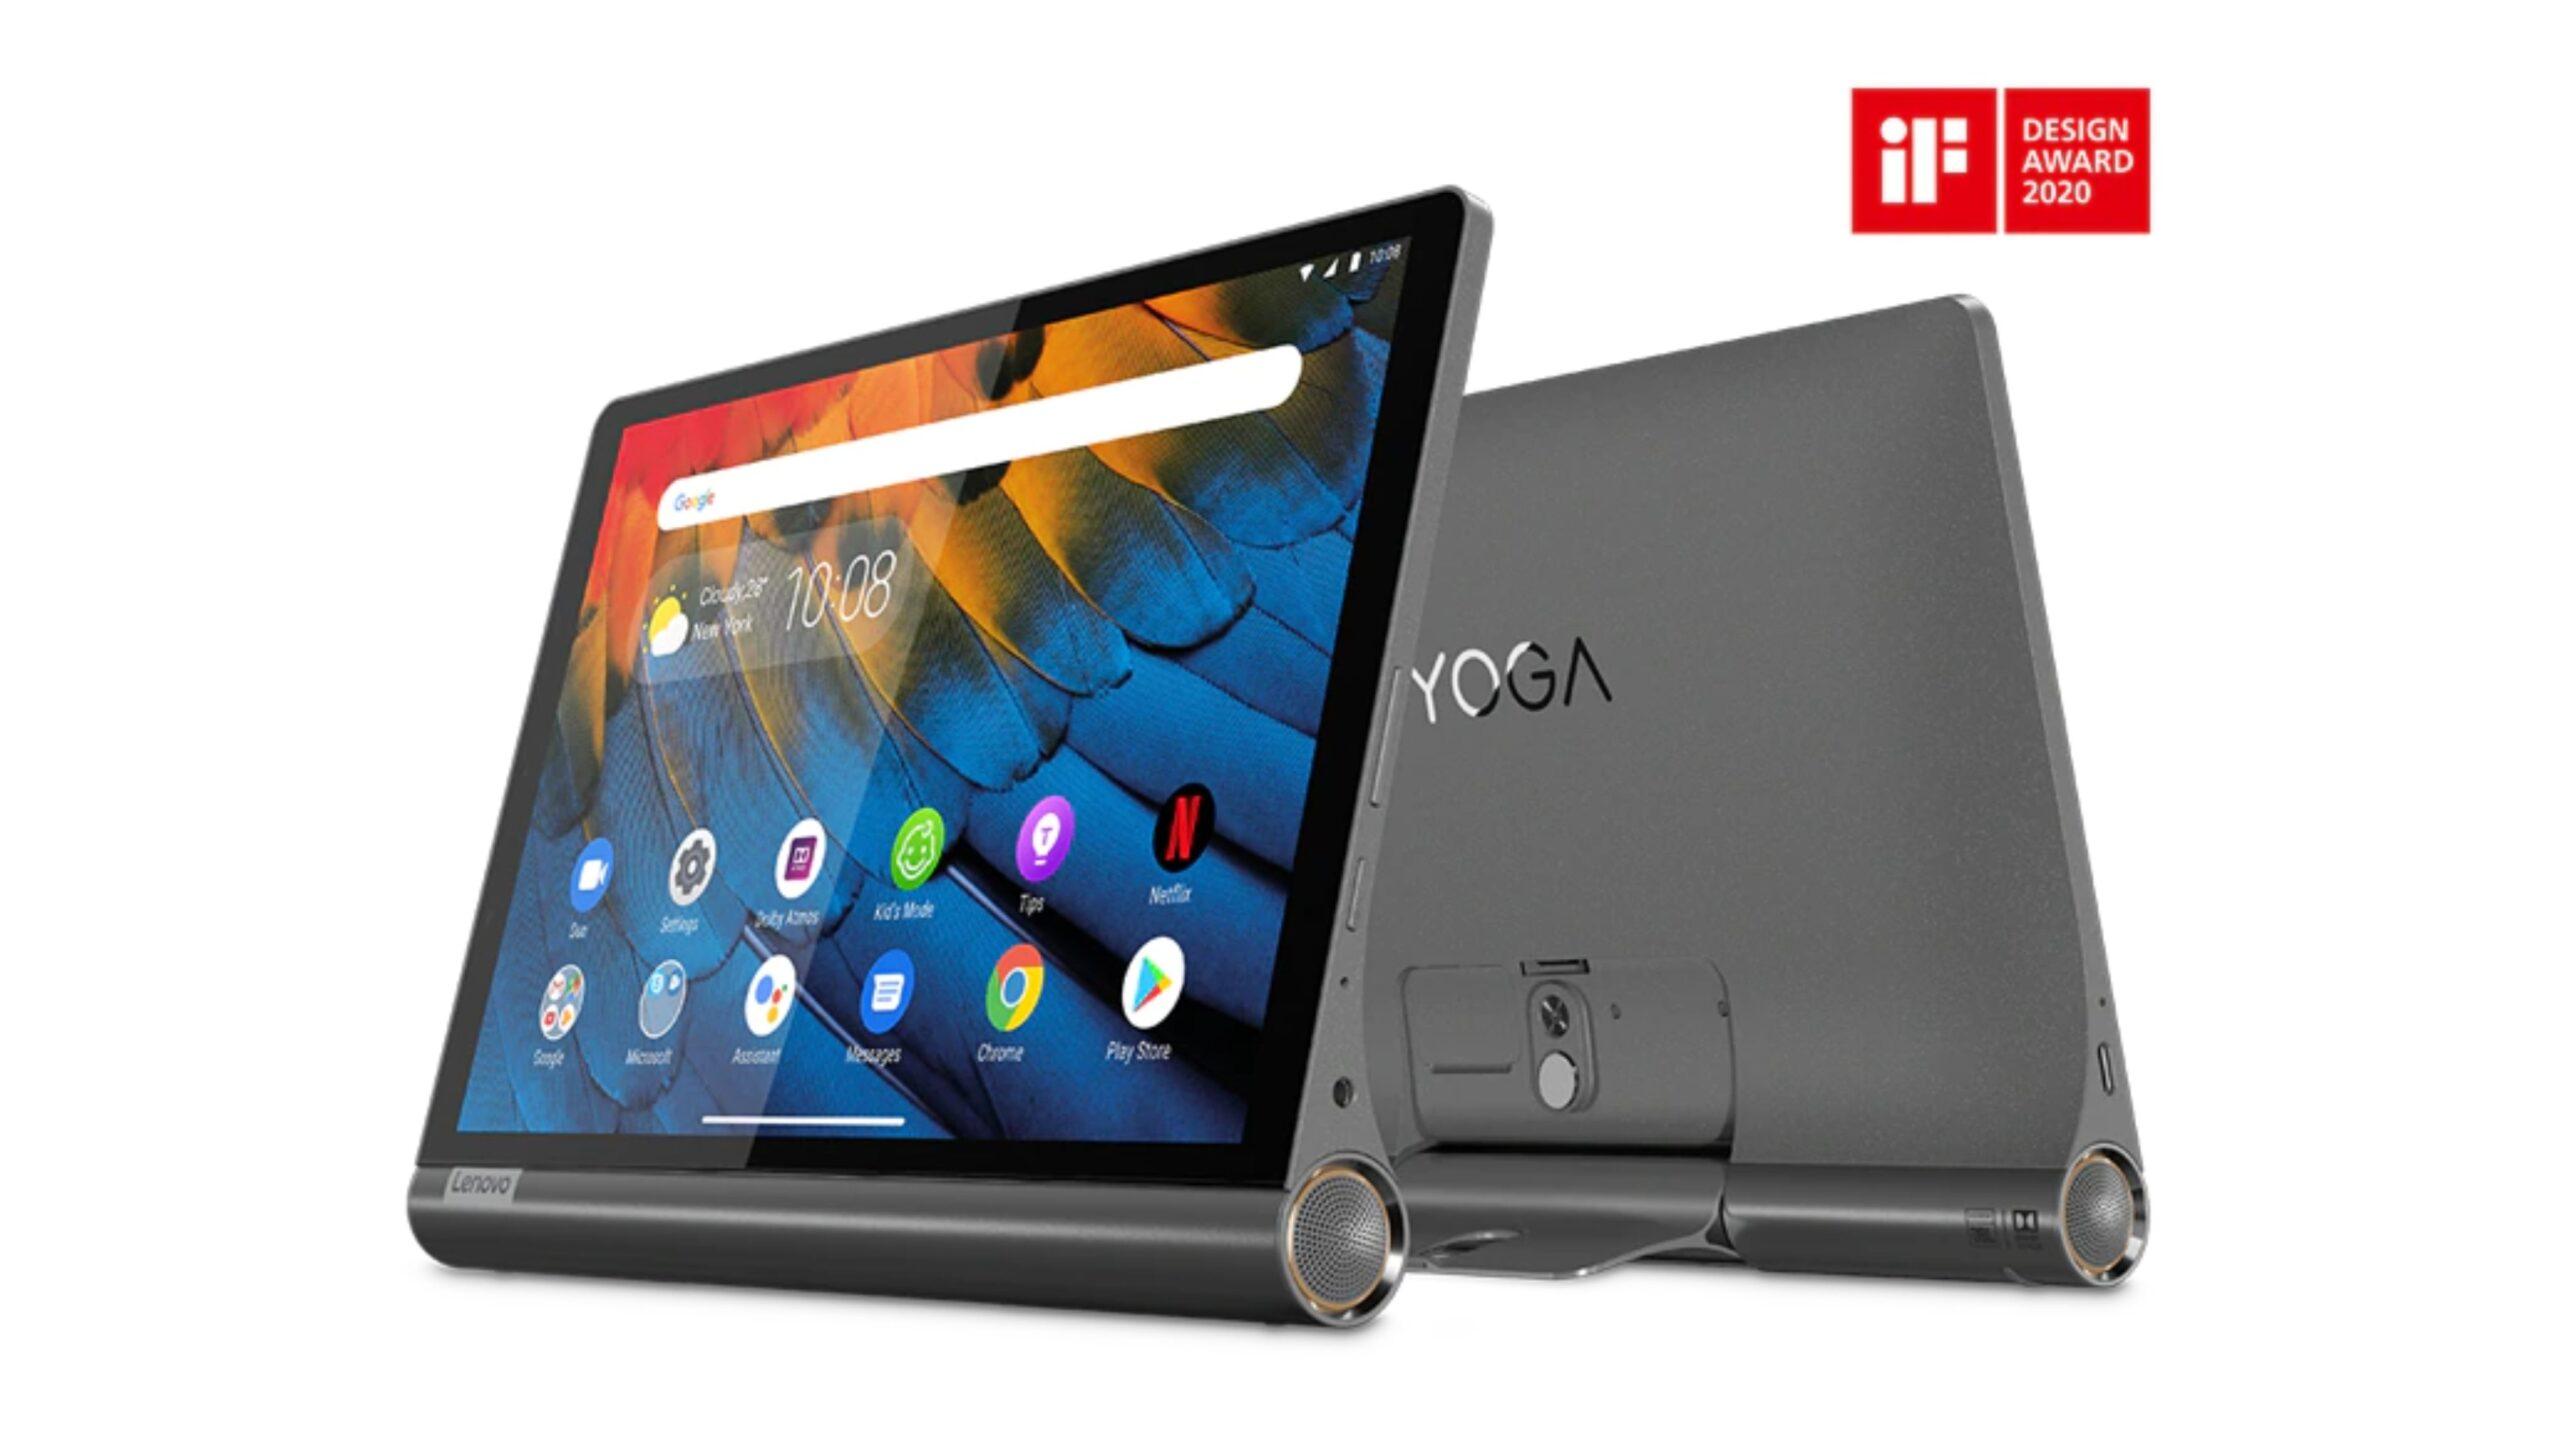 Lenovo YOGA Tab 13 key specs revealed via Geekbench and Google Play Console listings